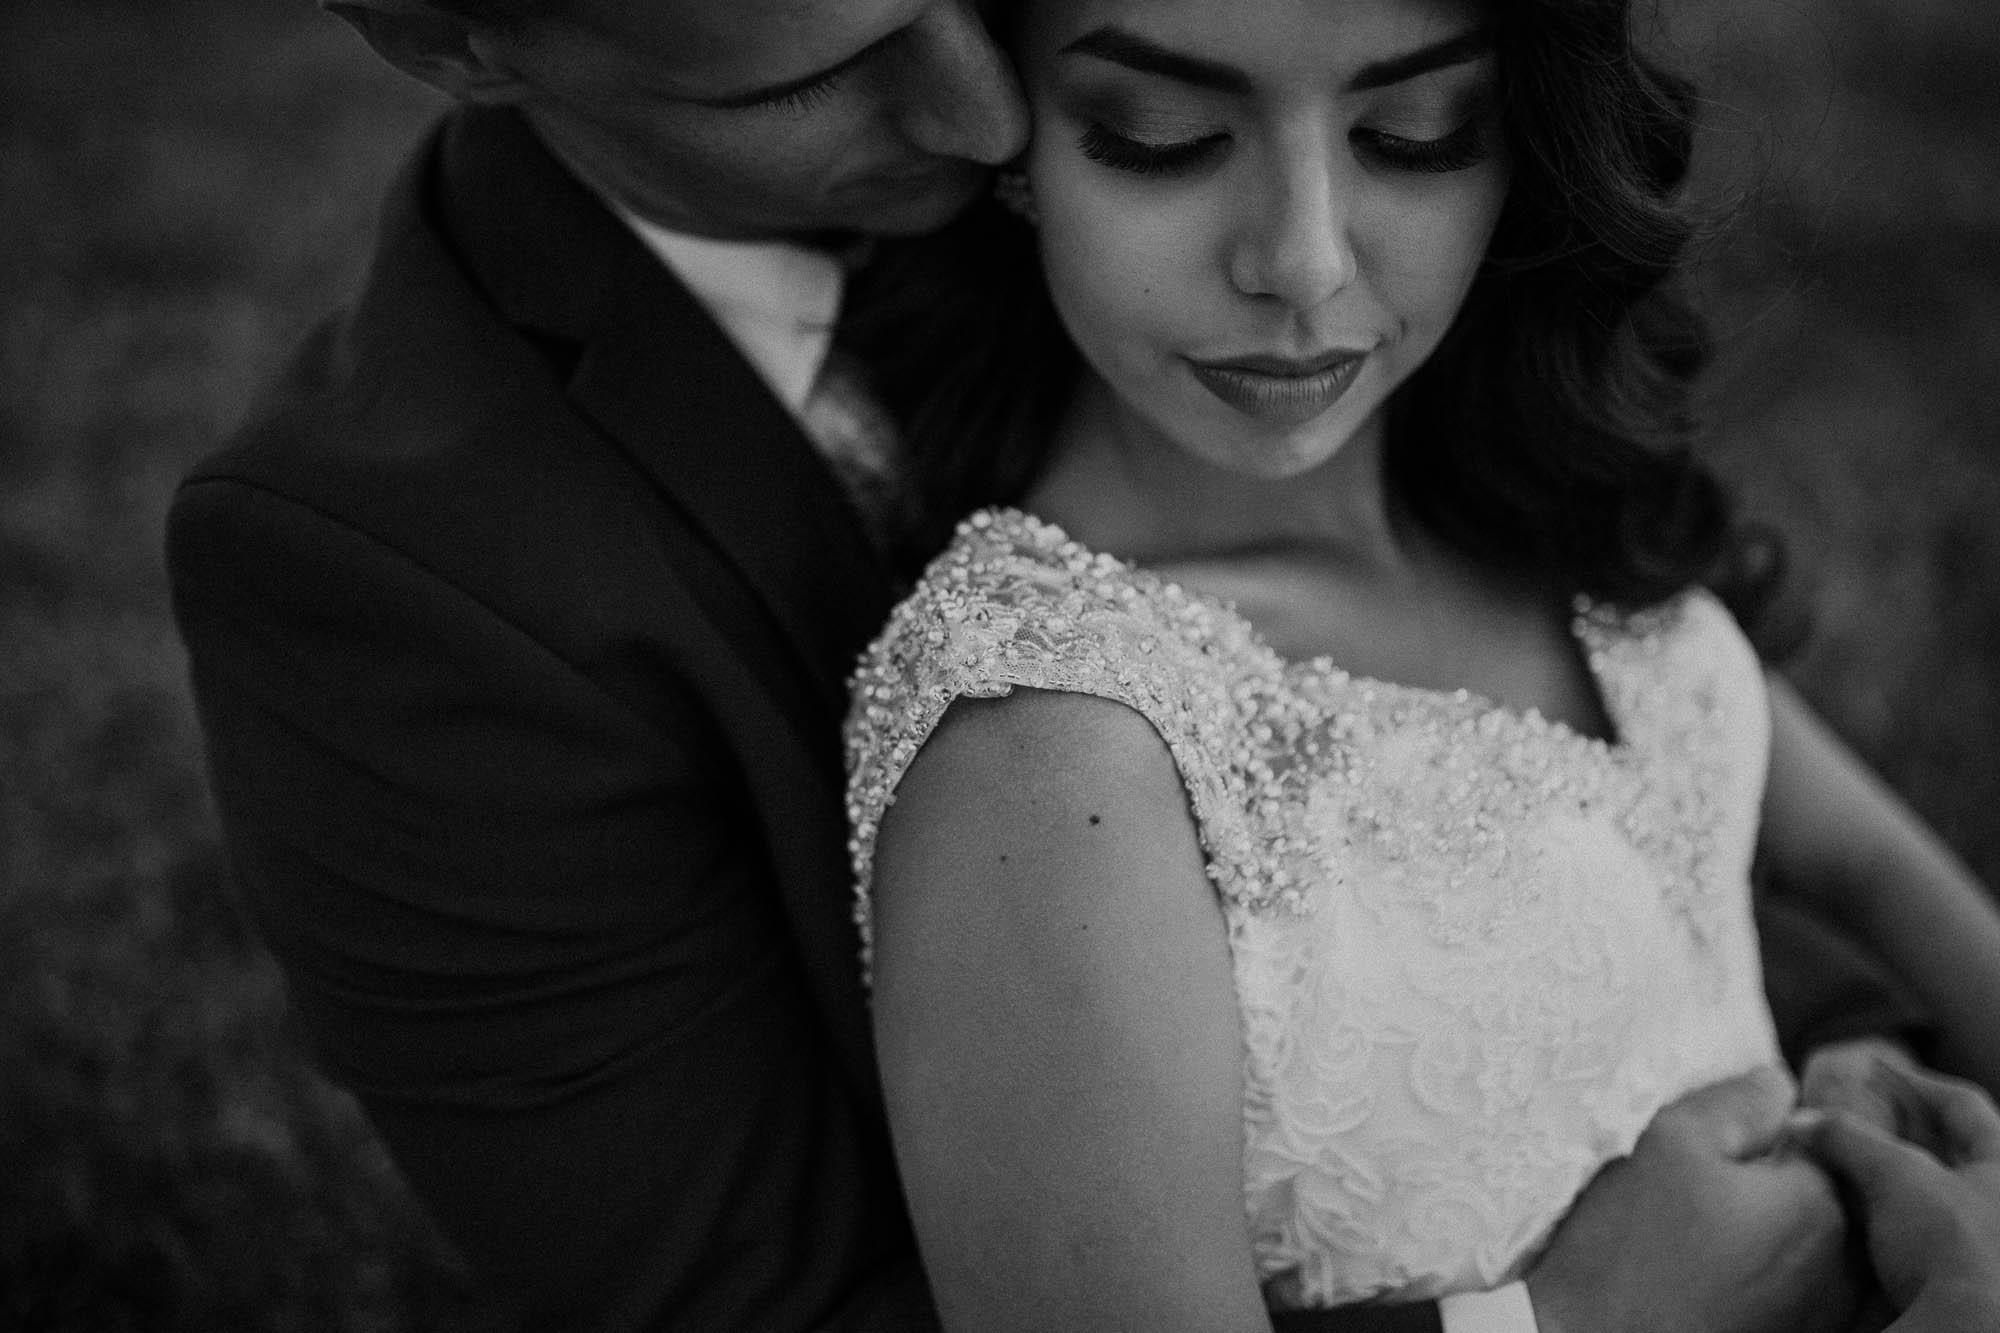 champaign_il_wedding_photography-0890.jpg